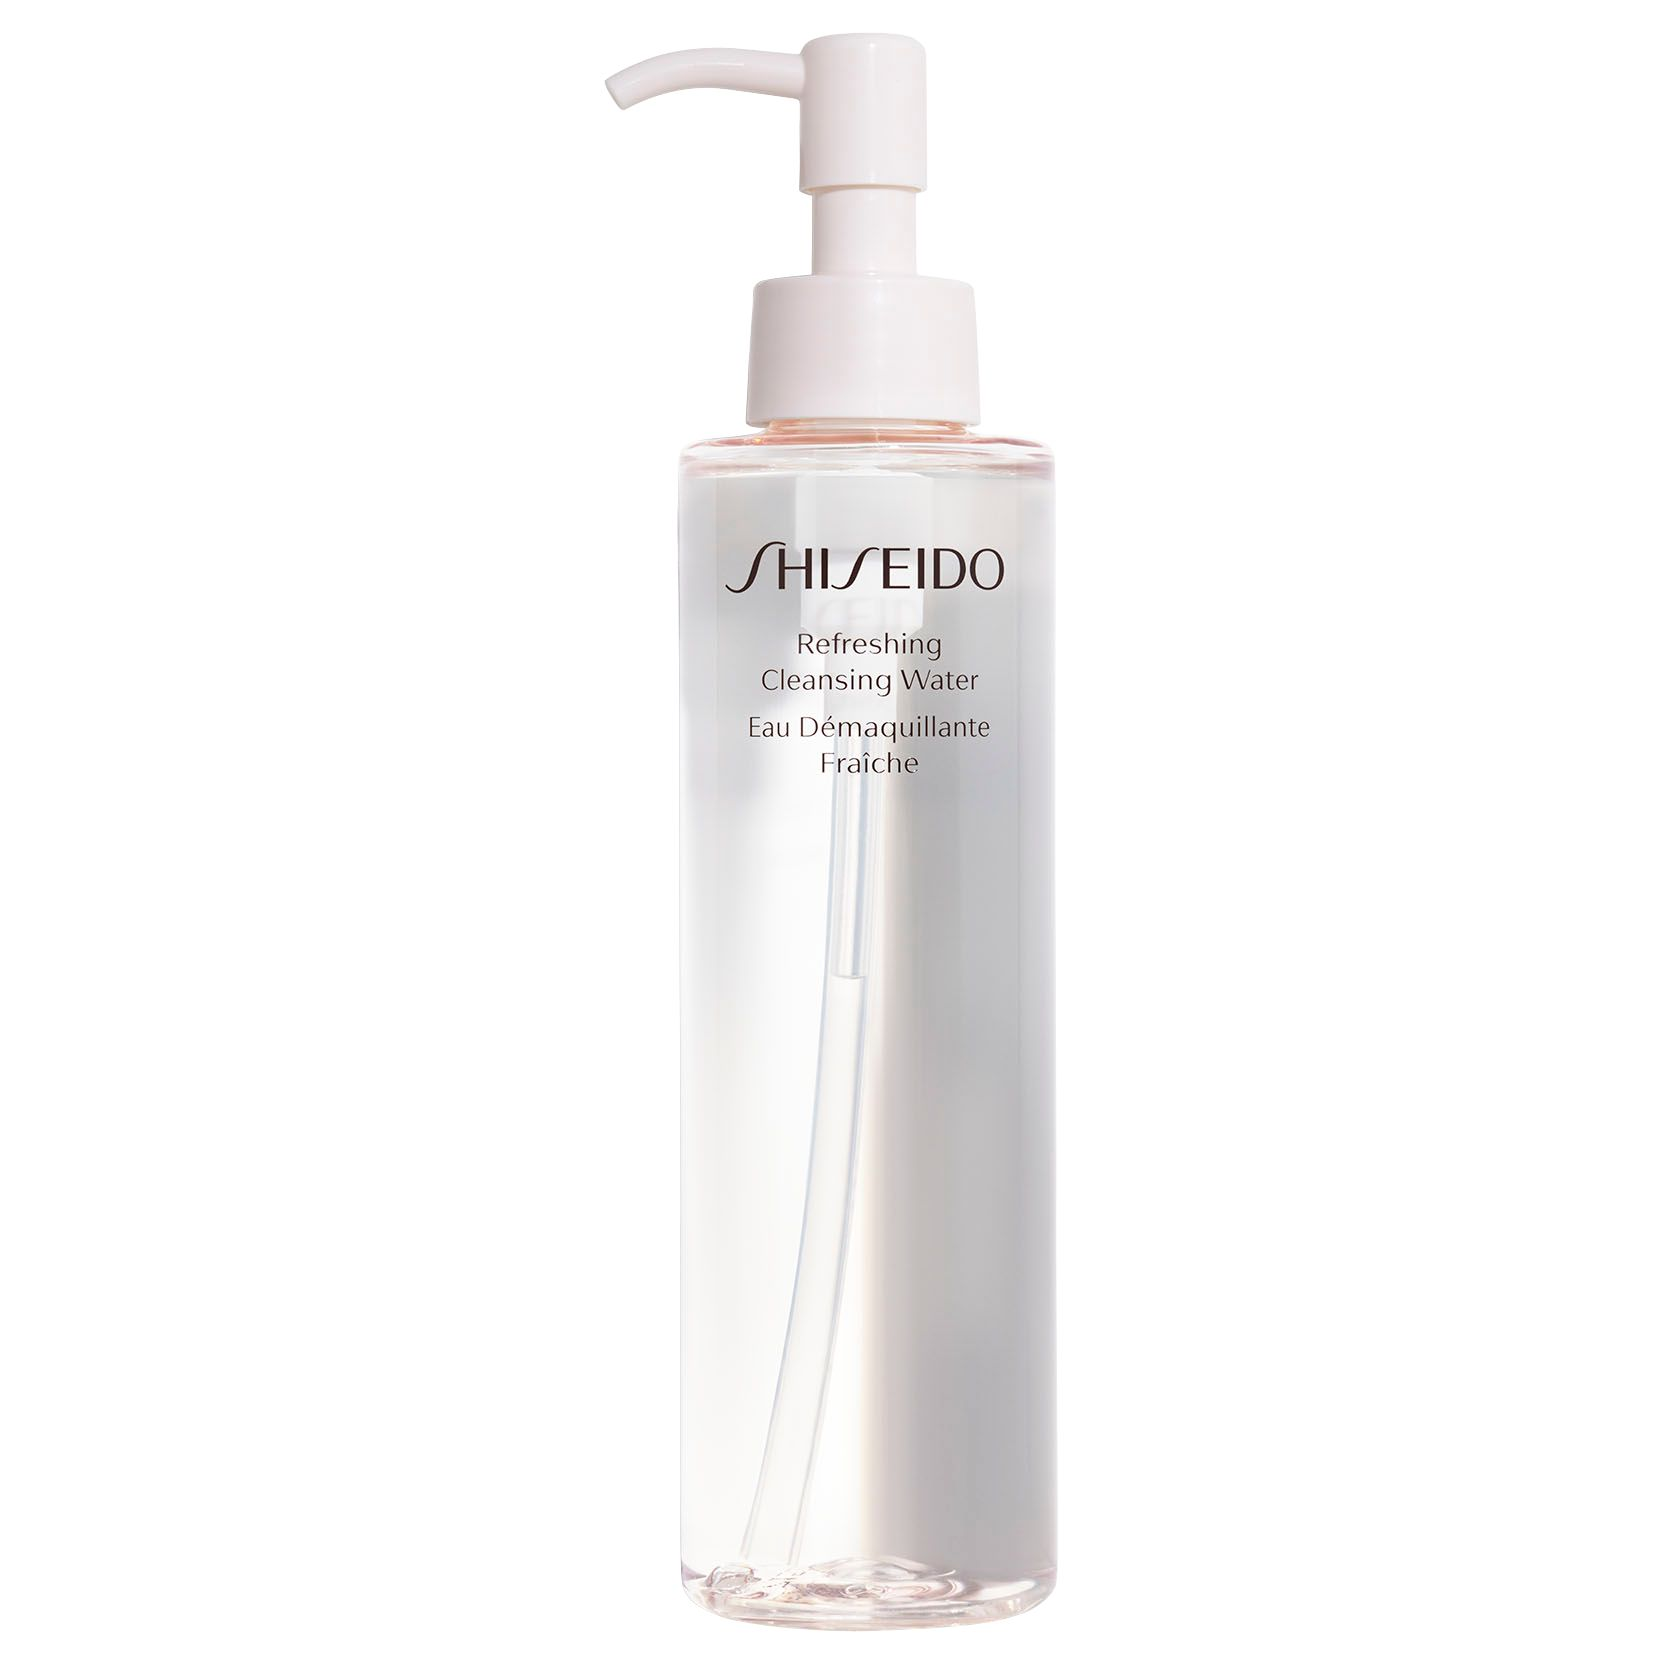 Shiseido Shiseido Refreshing Cleansing Water, 180ml